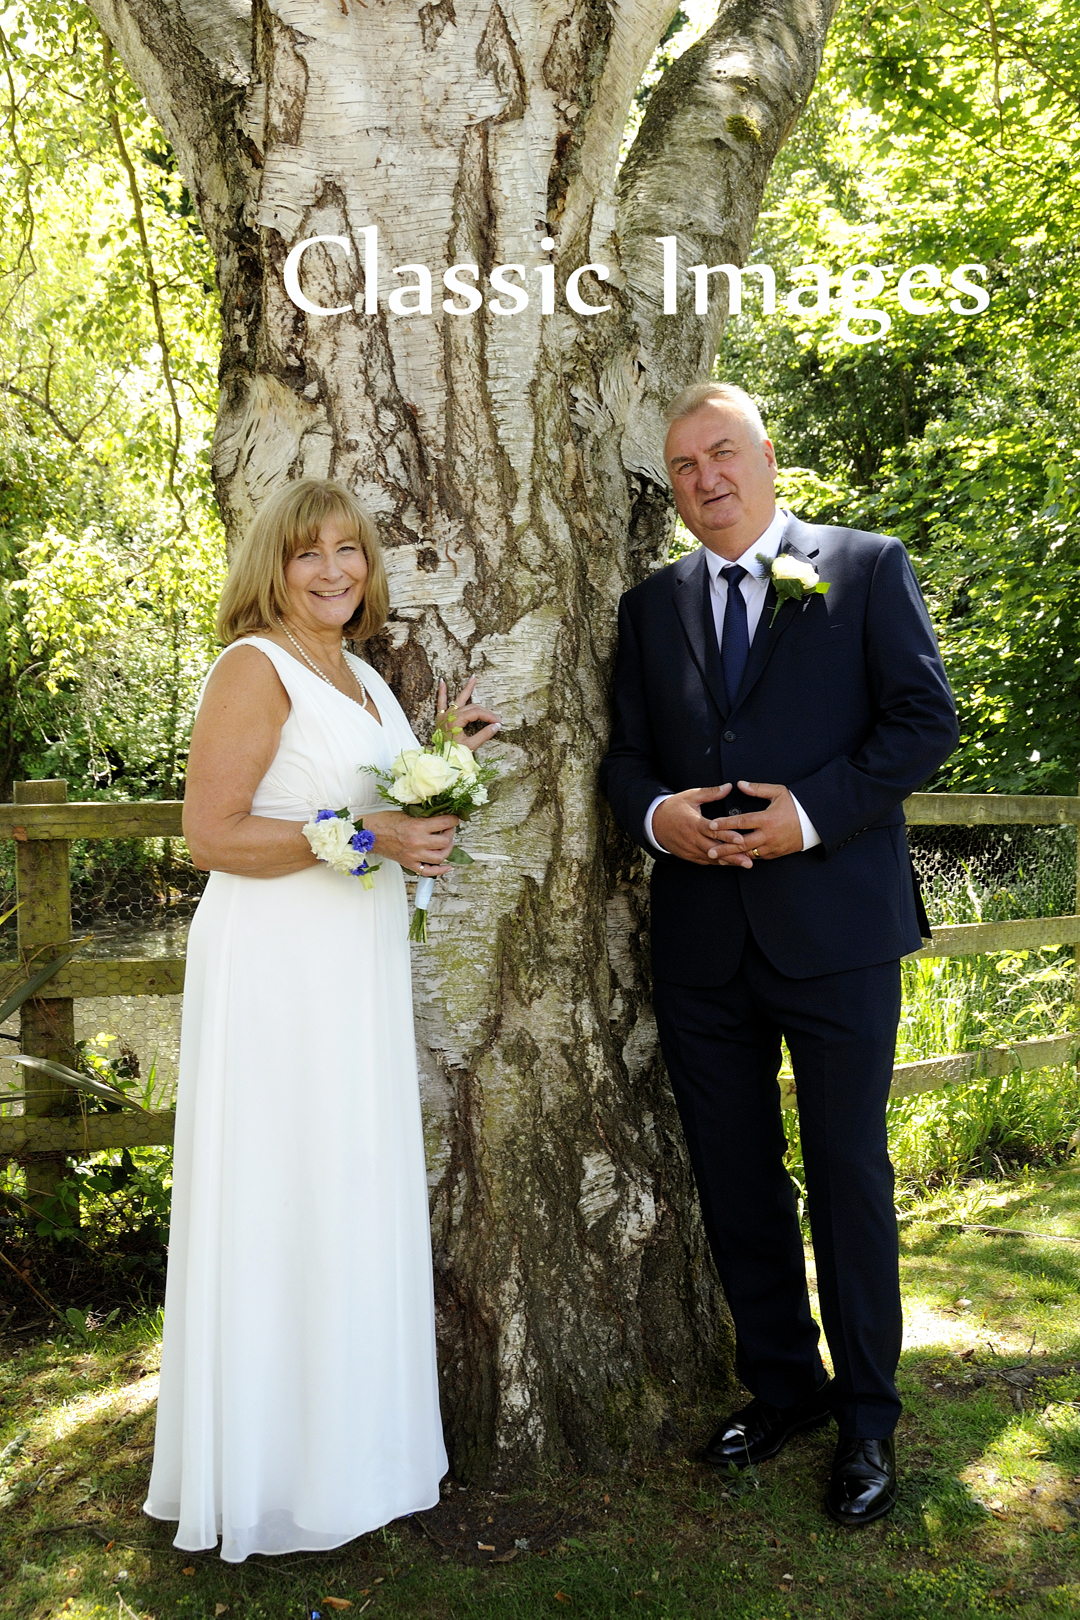 6-interesting-different-fun-romantic-wedding-photos-classic-images-surrey